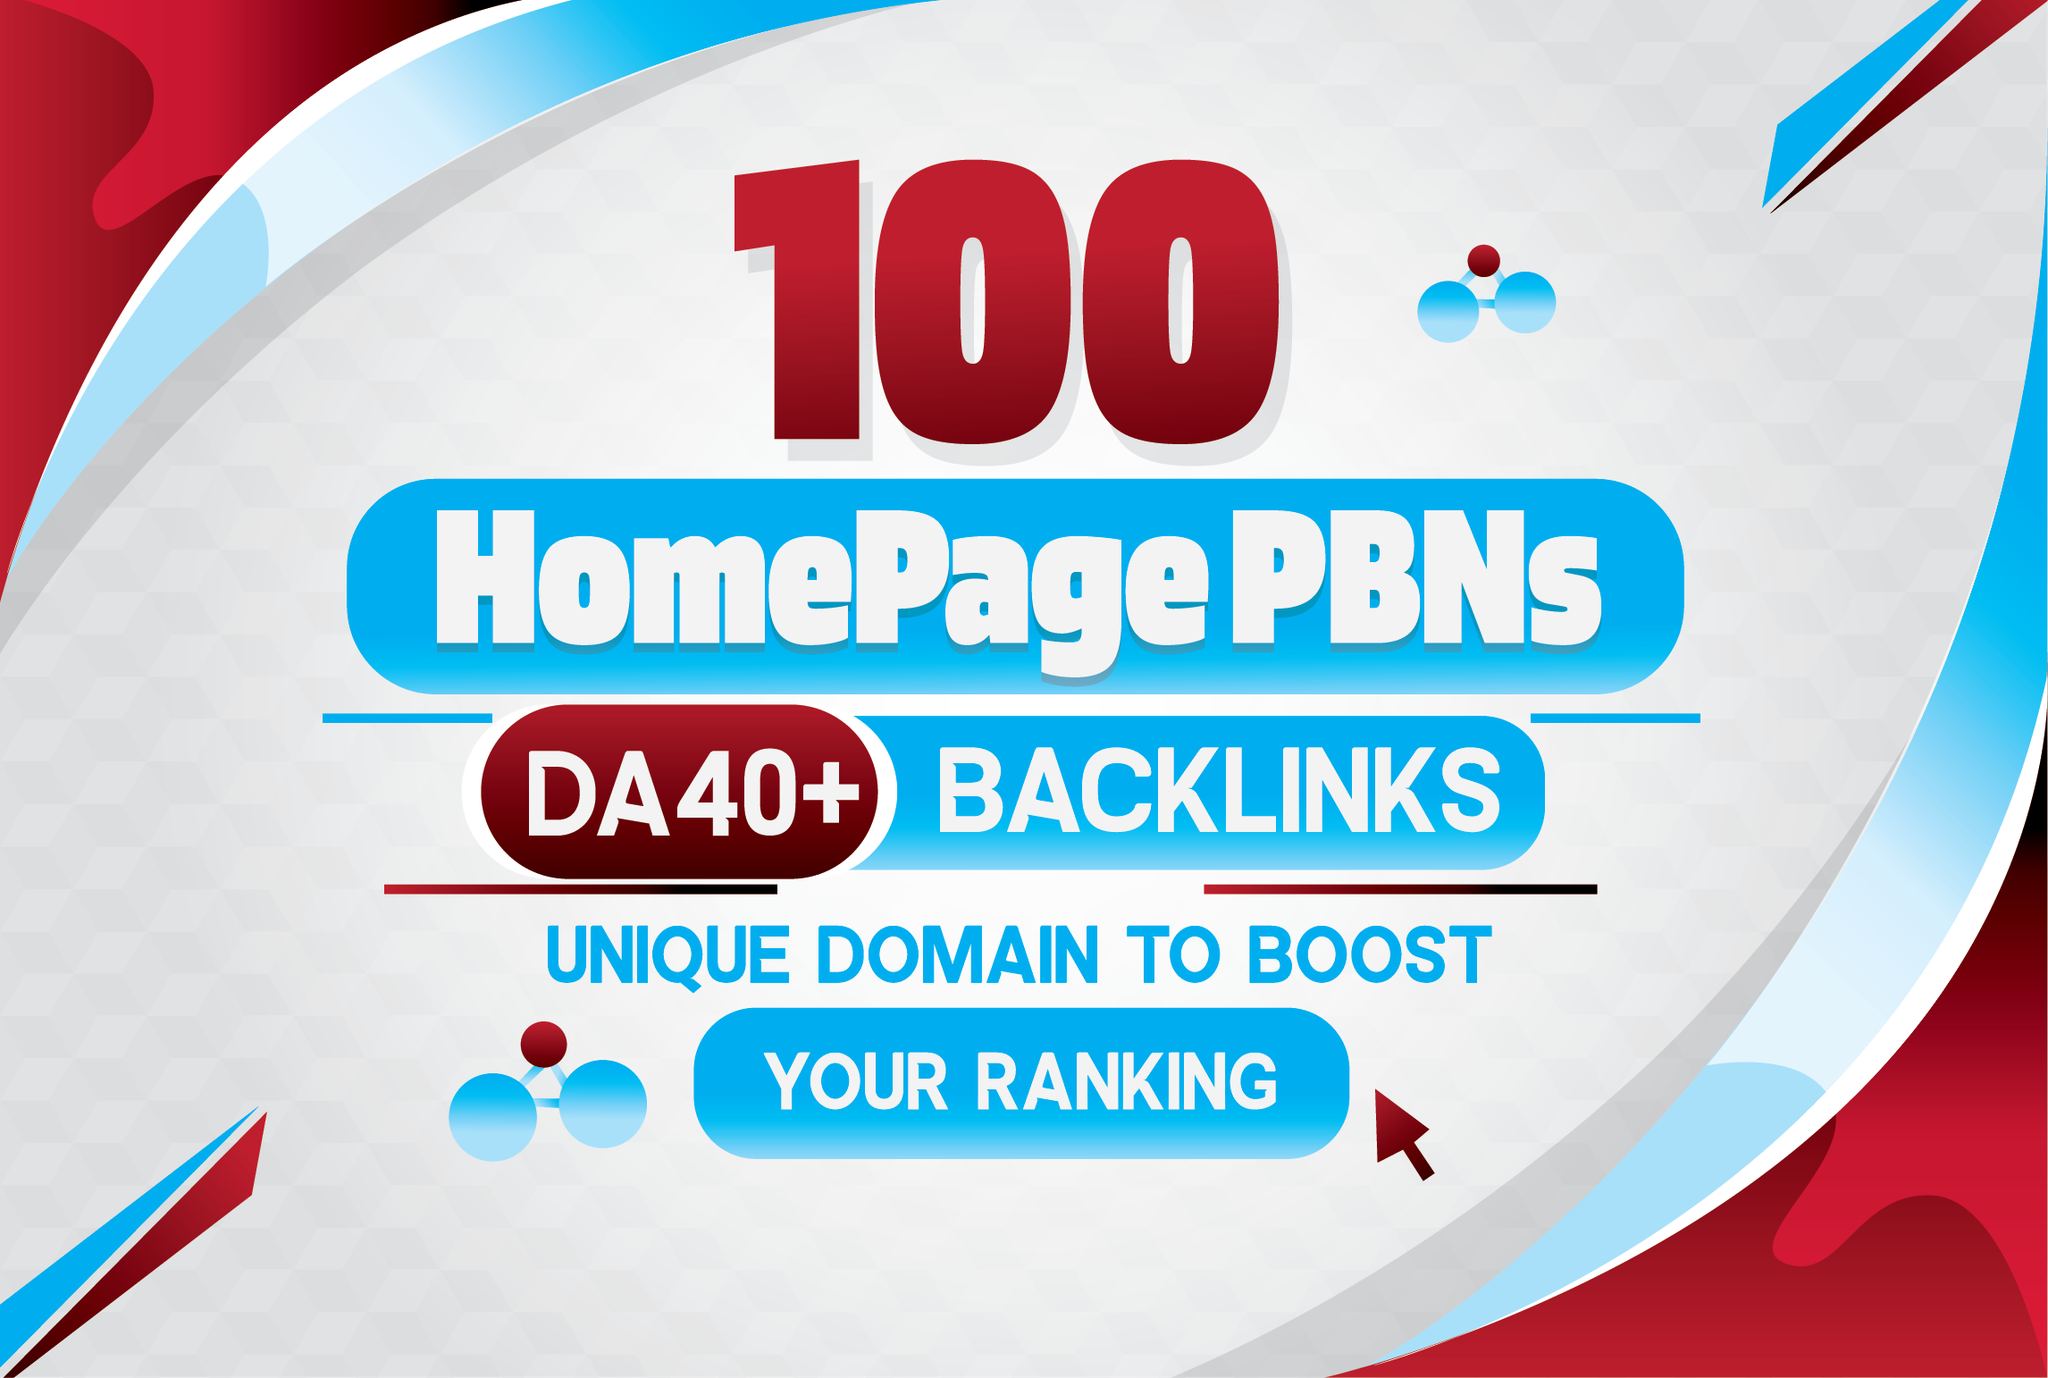 Build 100 Powerful Homepage PBNs On DA40+ Unique websites